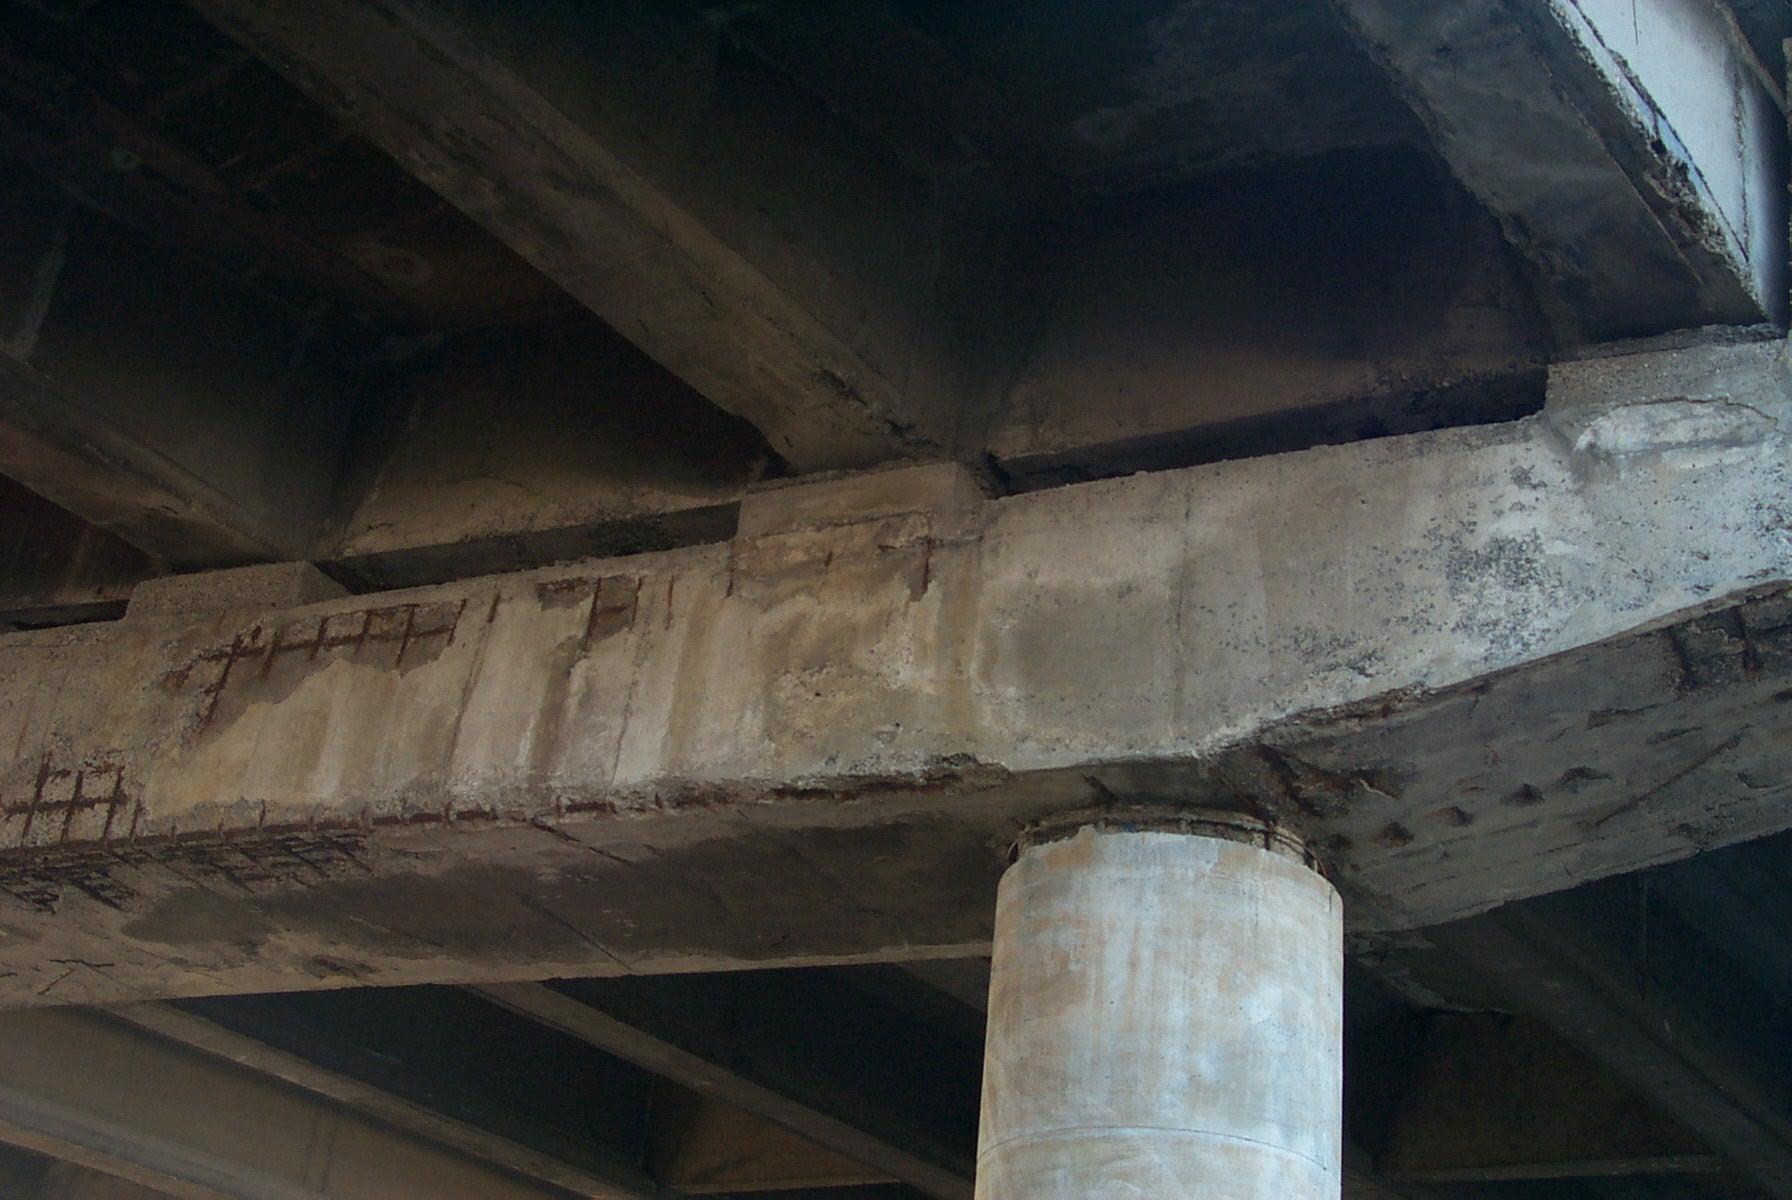 Reparatii pasaje km 11 si 13 pe A1 MAPEI - Poza 46